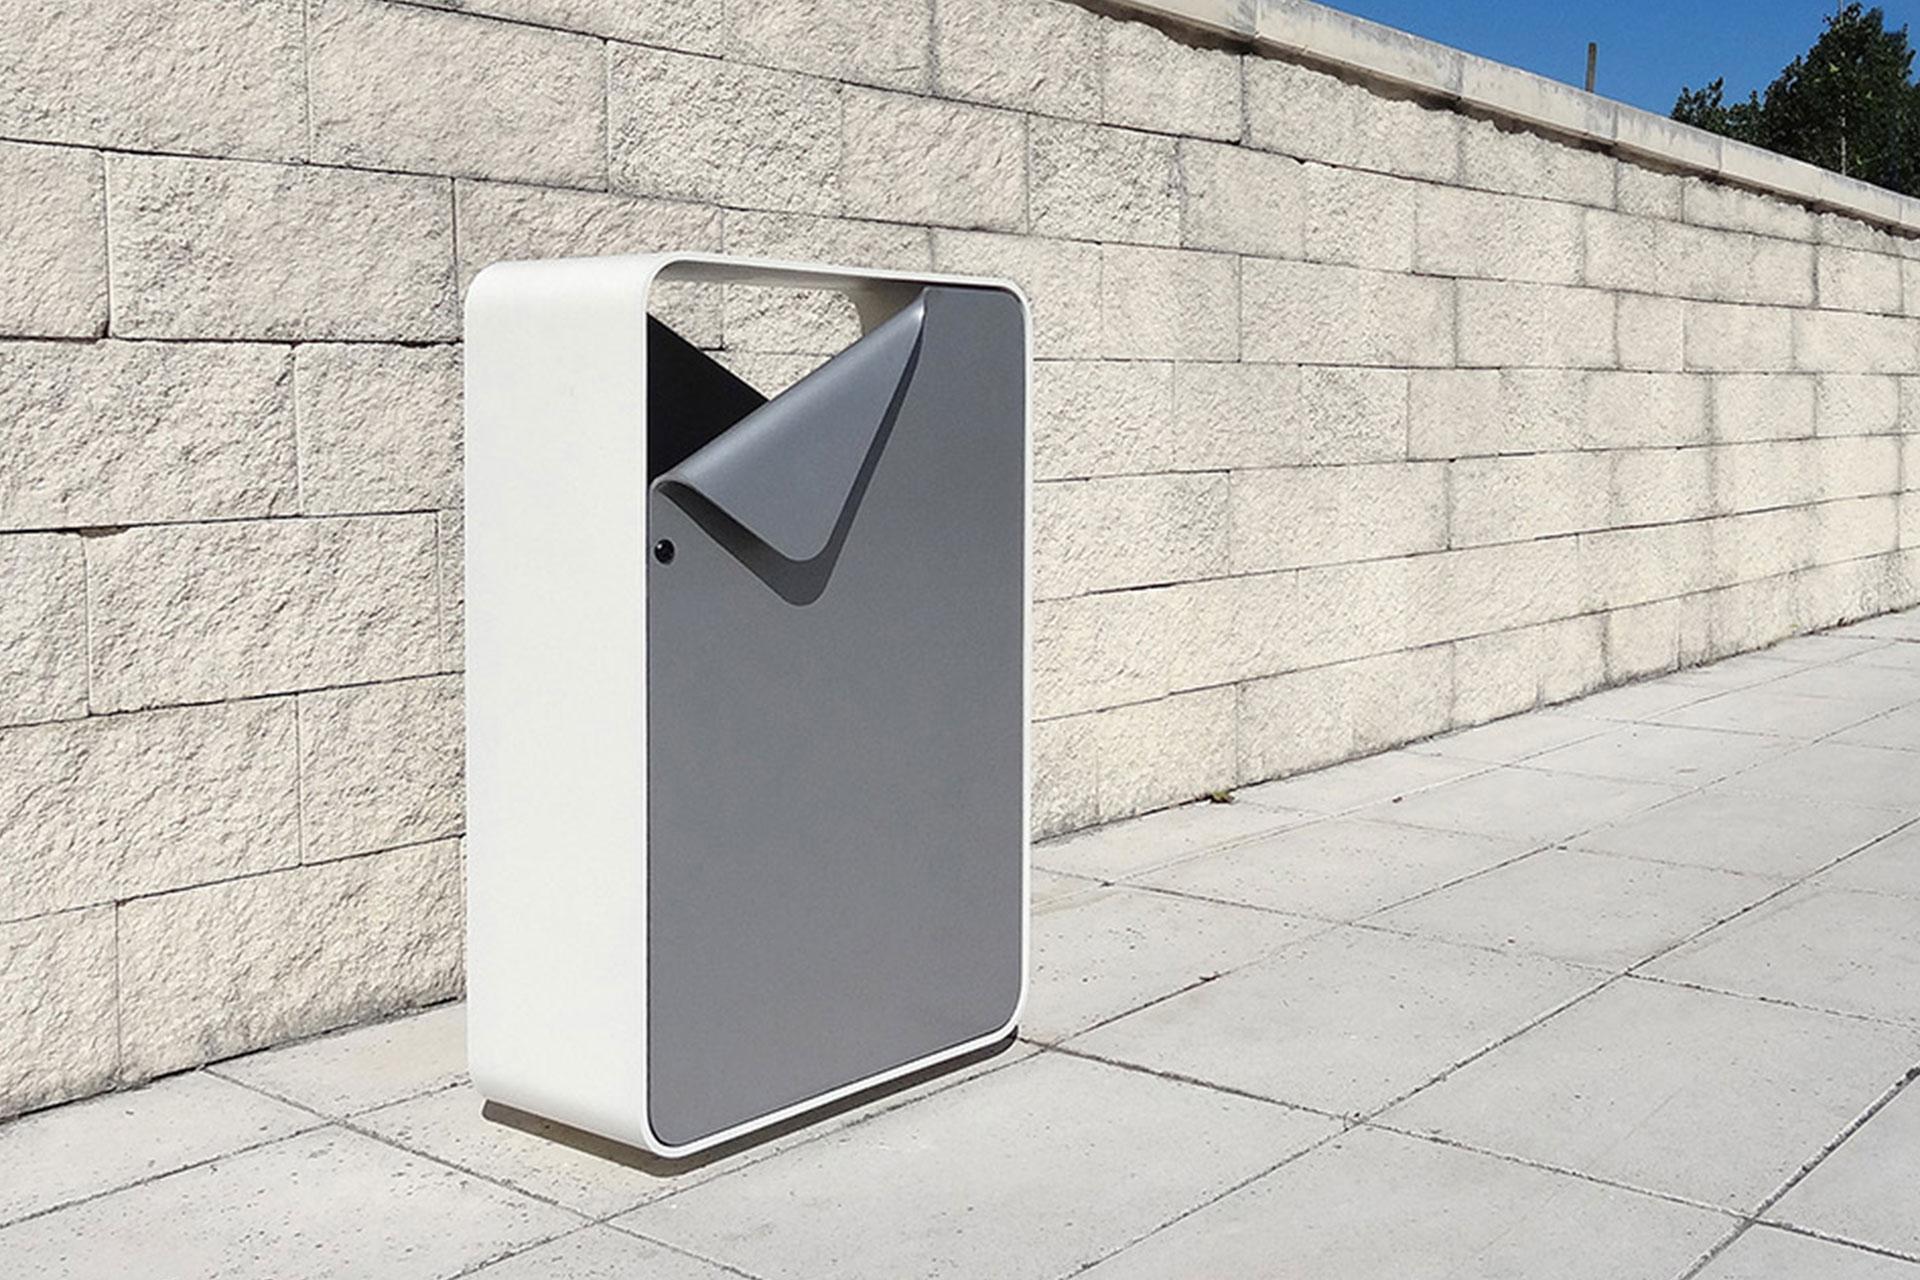 UrbanObjekts Sheet Abfallbehälter